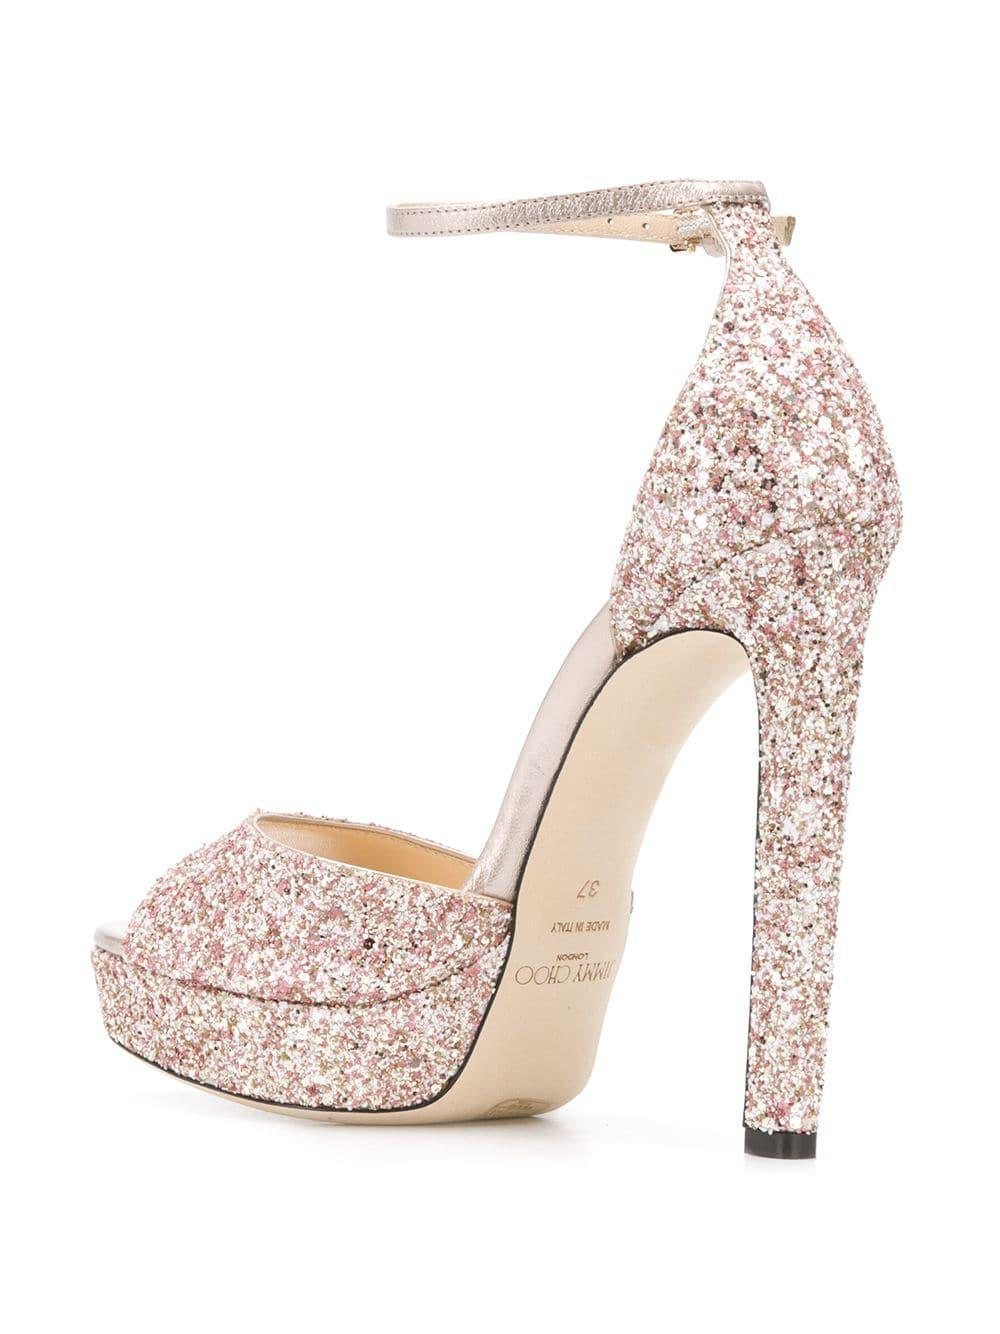 c50fc7ebe210 Jimmy Choo Pattie 130 Sandals in Pink - Lyst